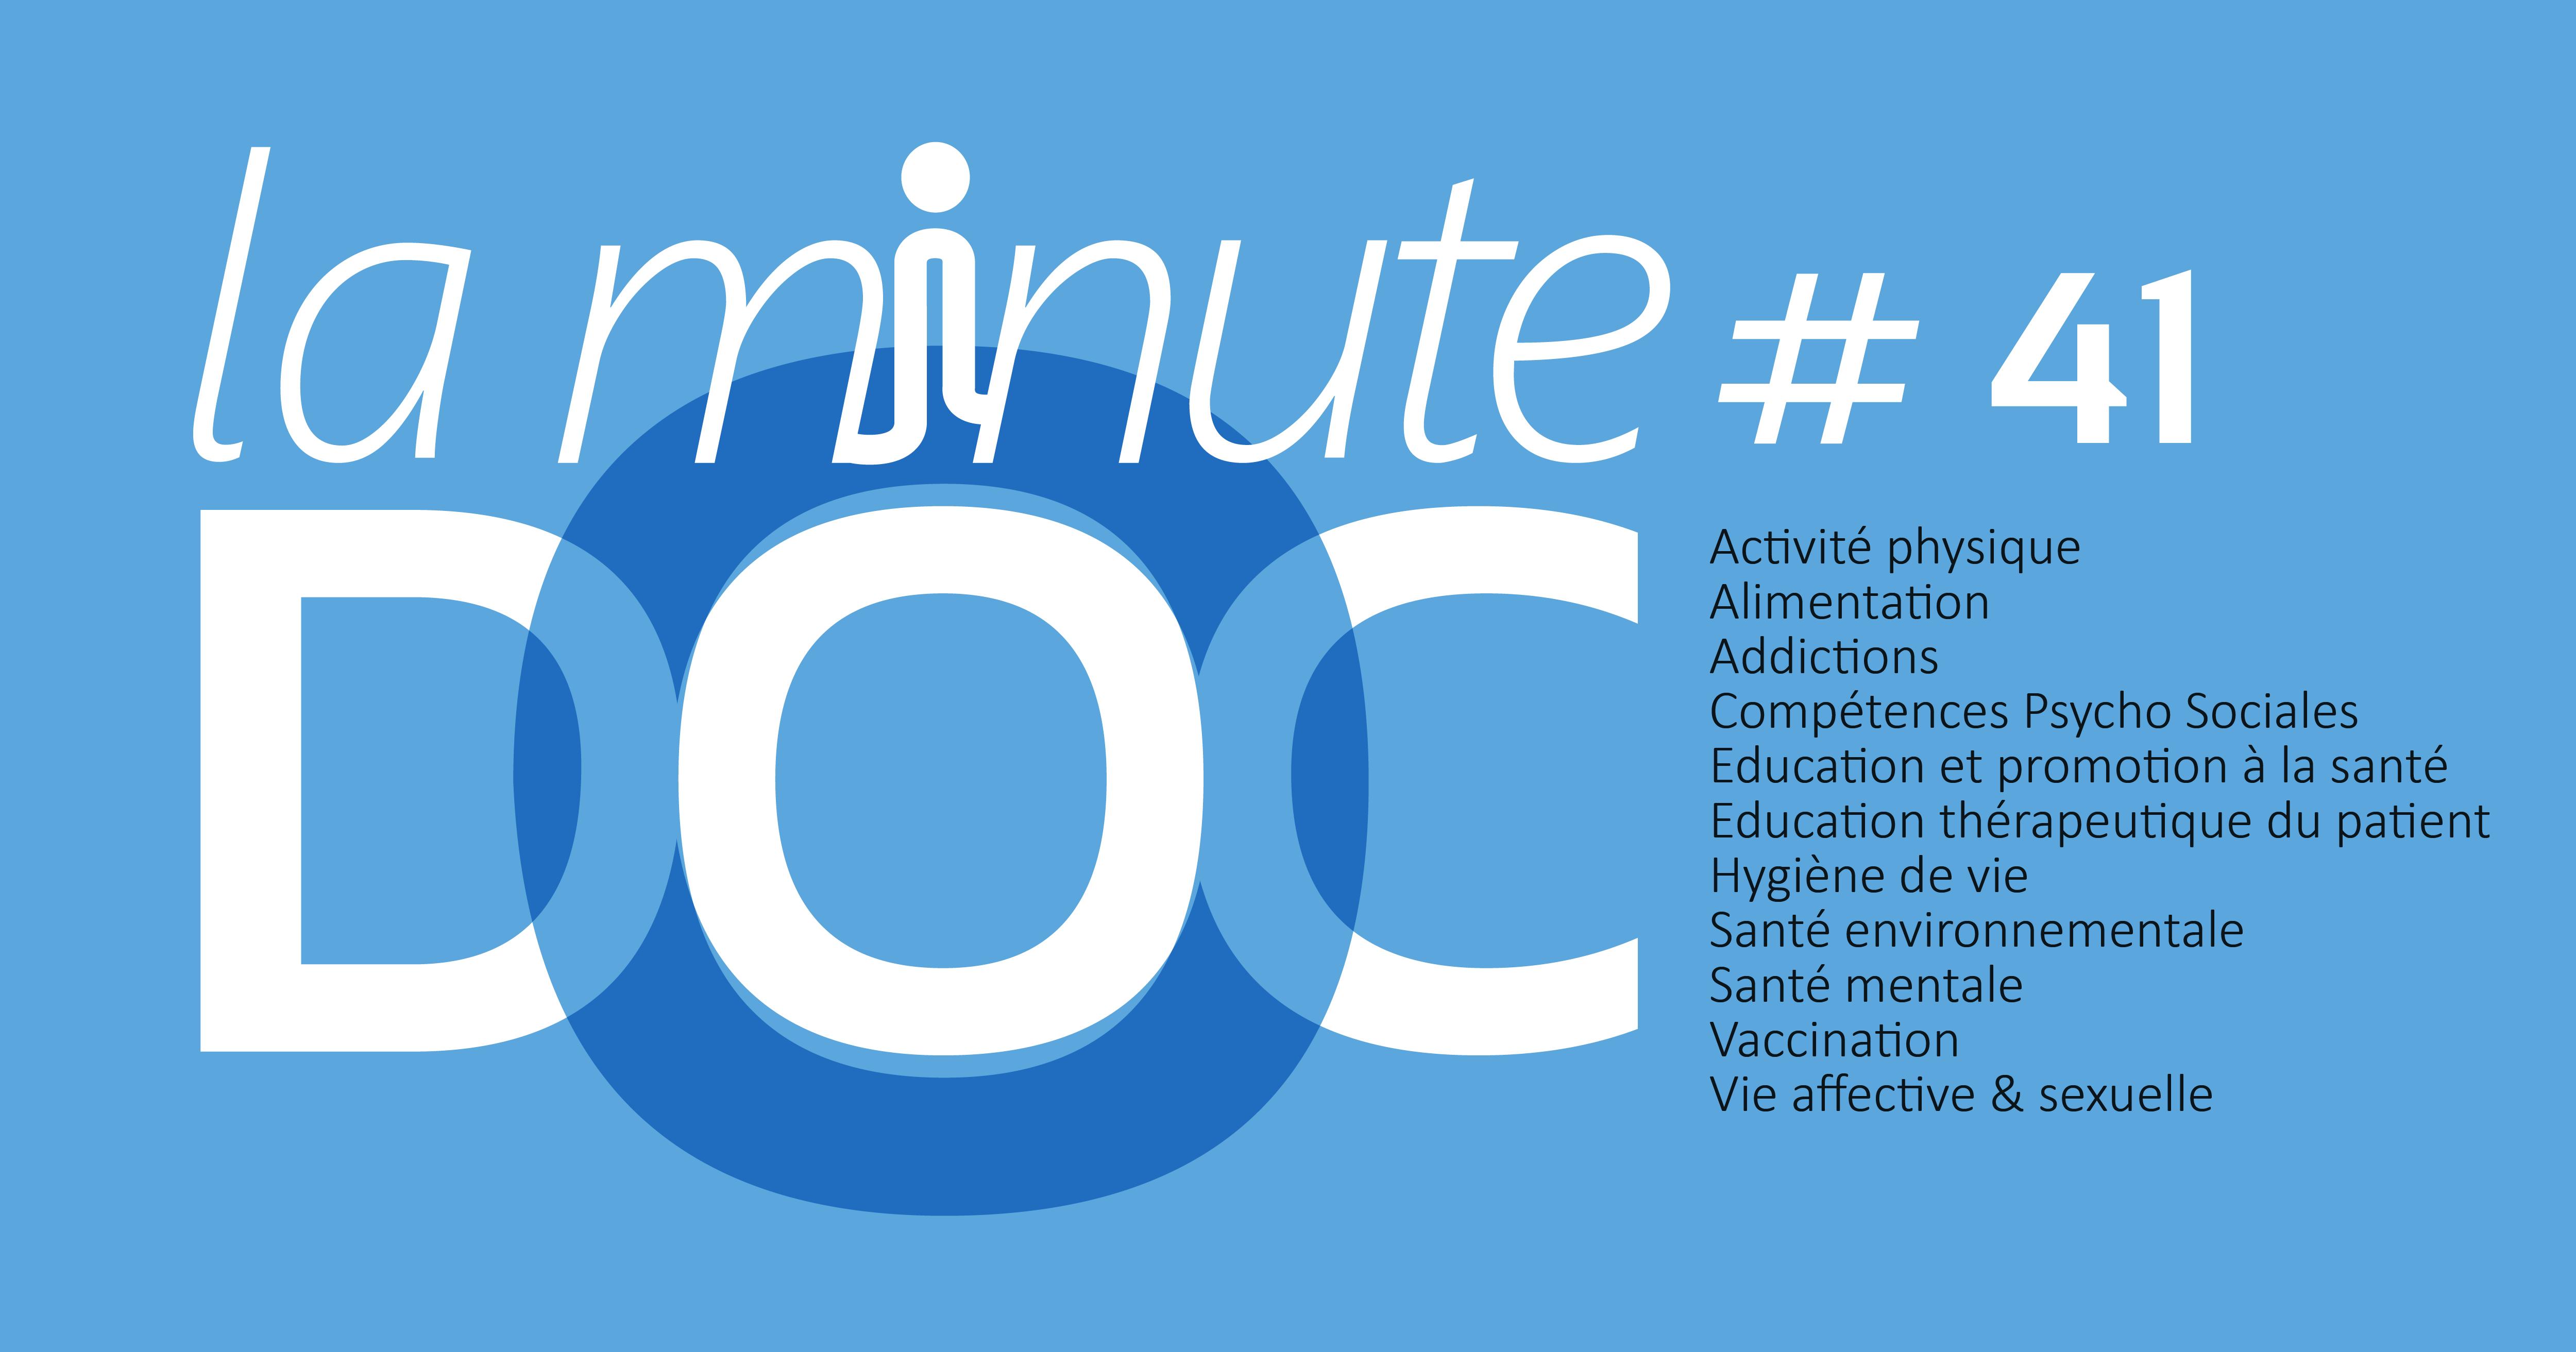 la minute DOC#41